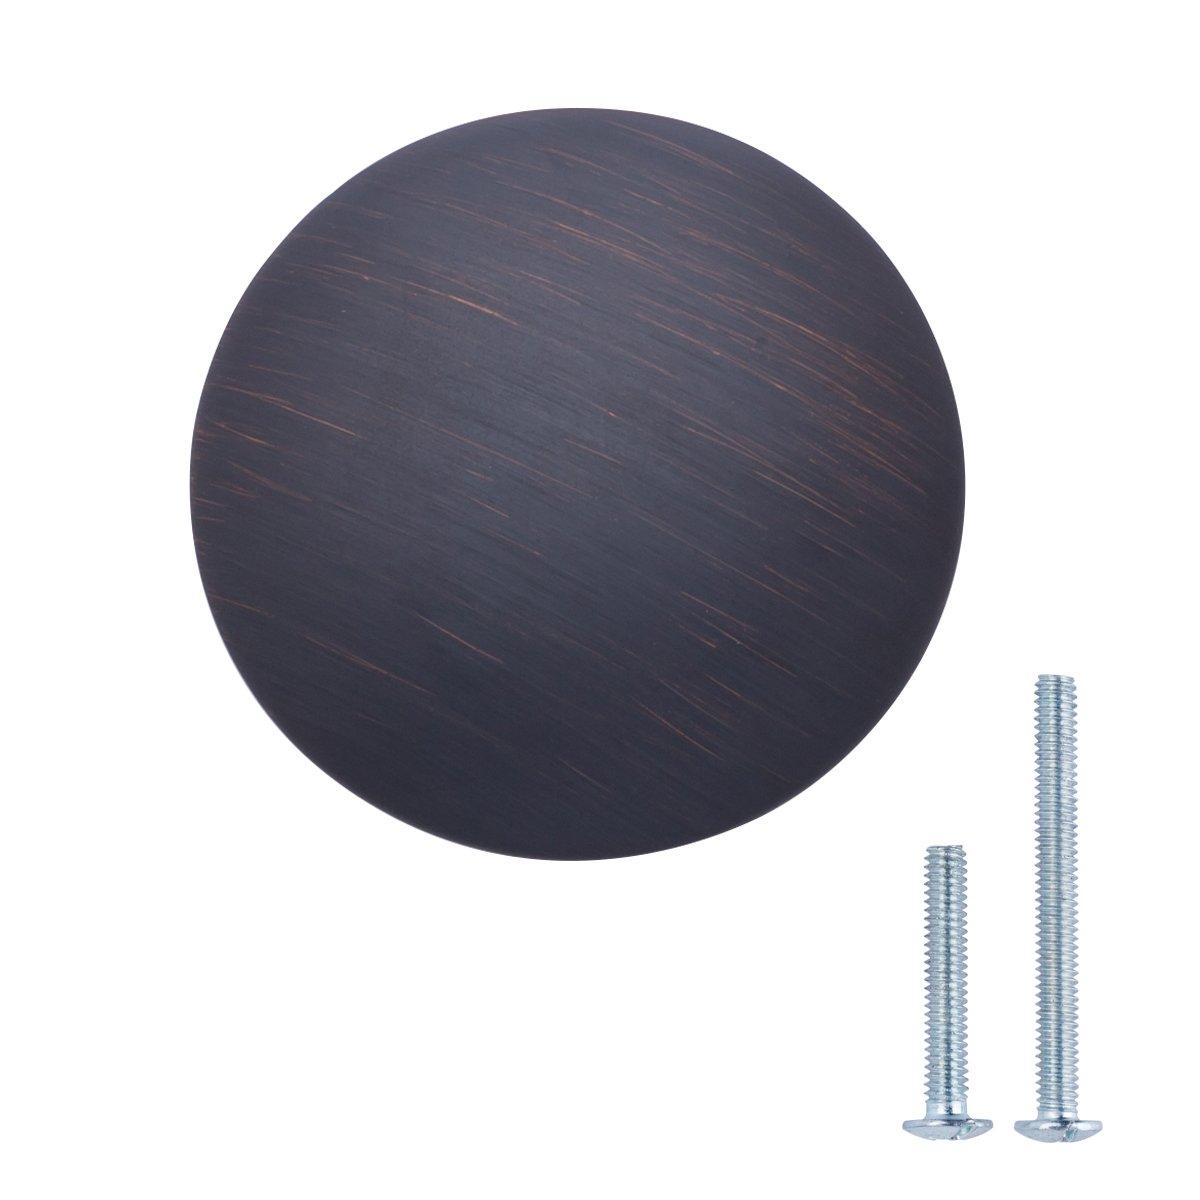 AmazonBasics Round Cabinet Knob, 1.18'' Diameter, Oil Rubbed Bronze, 10-Pack